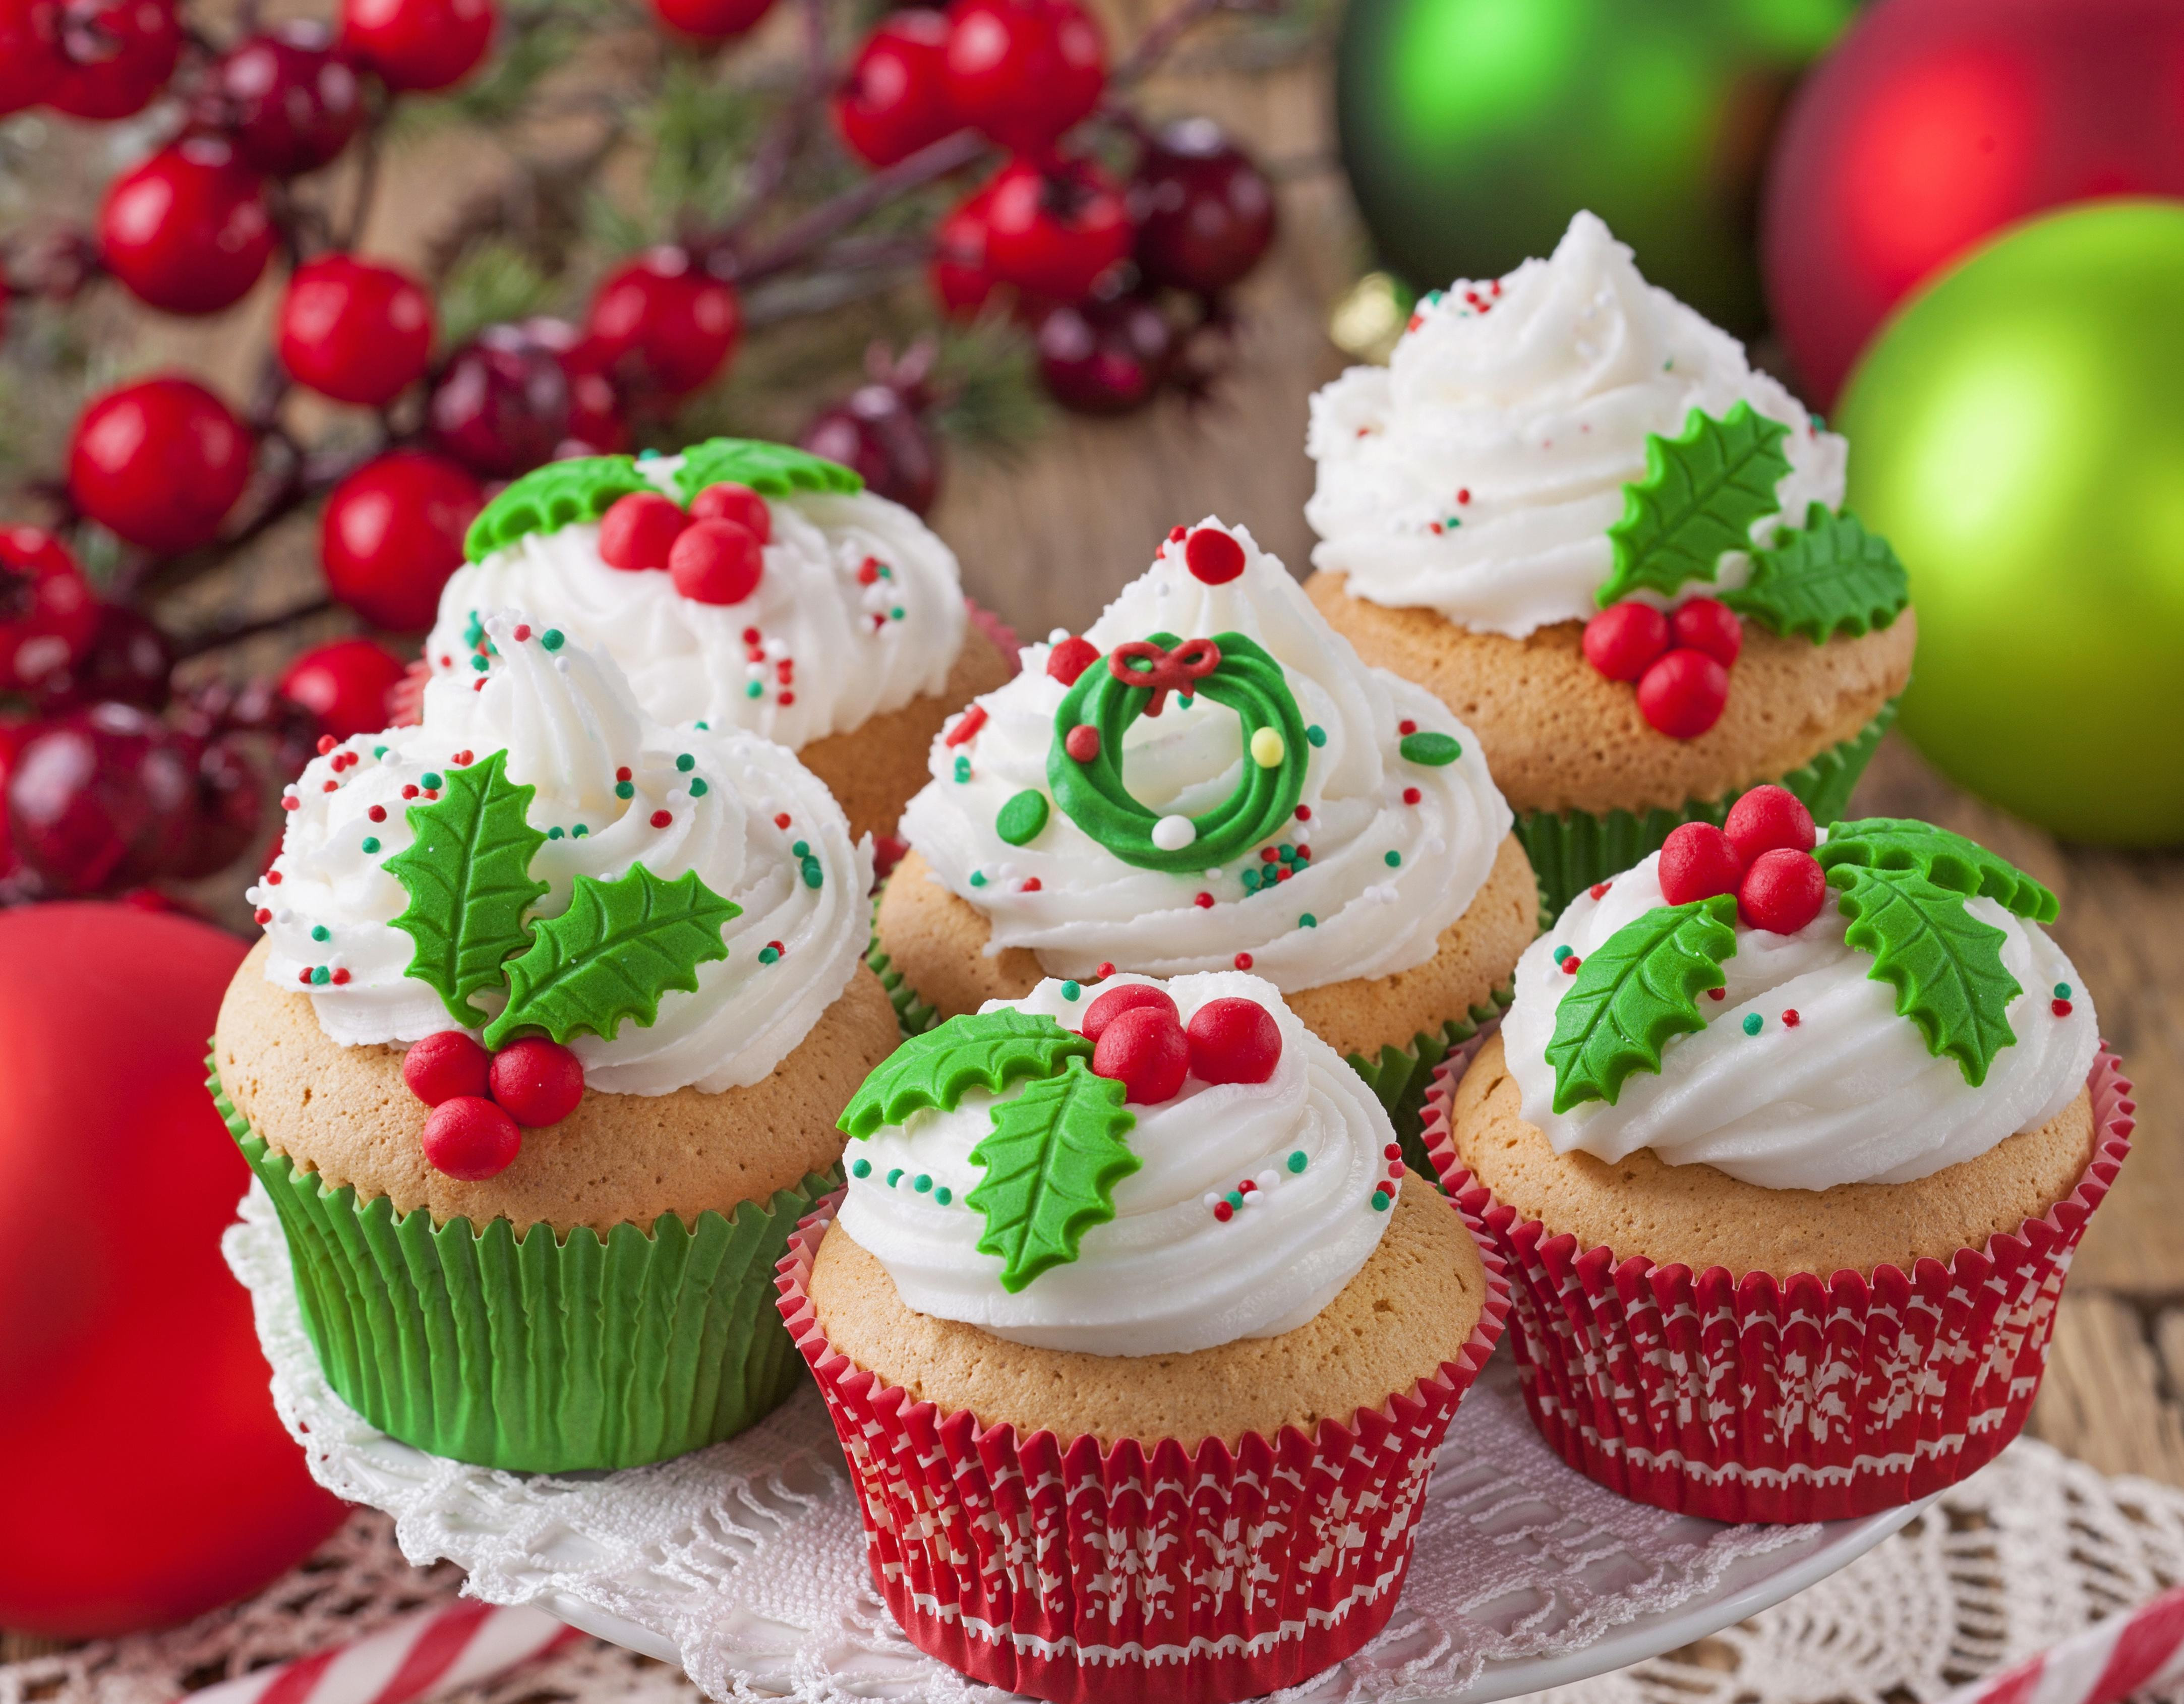 Christmas Themed Cupcakes  40 Joyous Christmas Themed Cupcakes Cupcakes Gallery